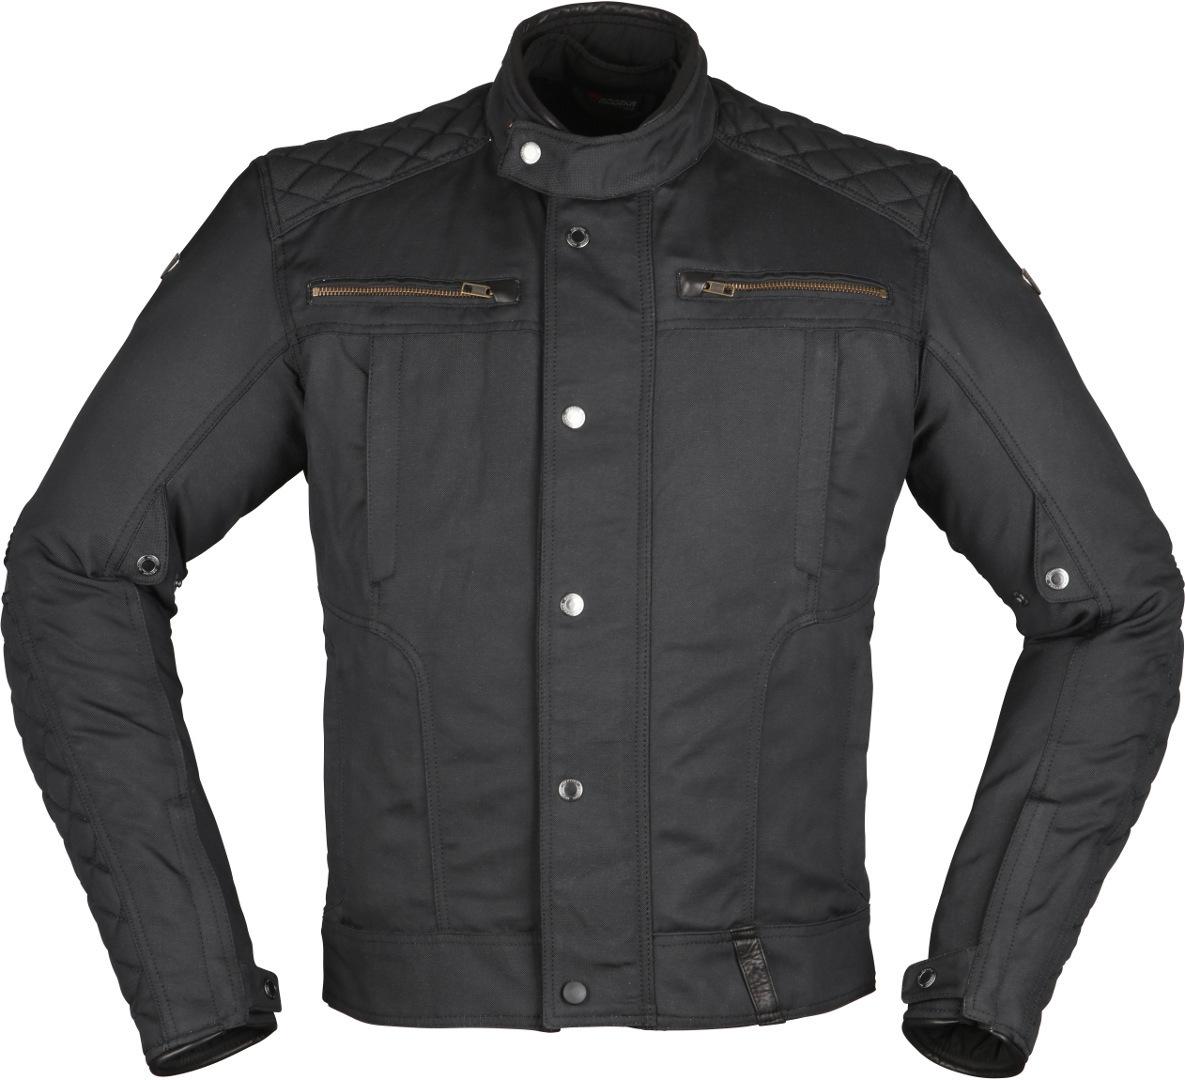 Modeka Thiago Motorrad Textiljacke, schwarz, Größe 5XL, schwarz, Größe 5XL